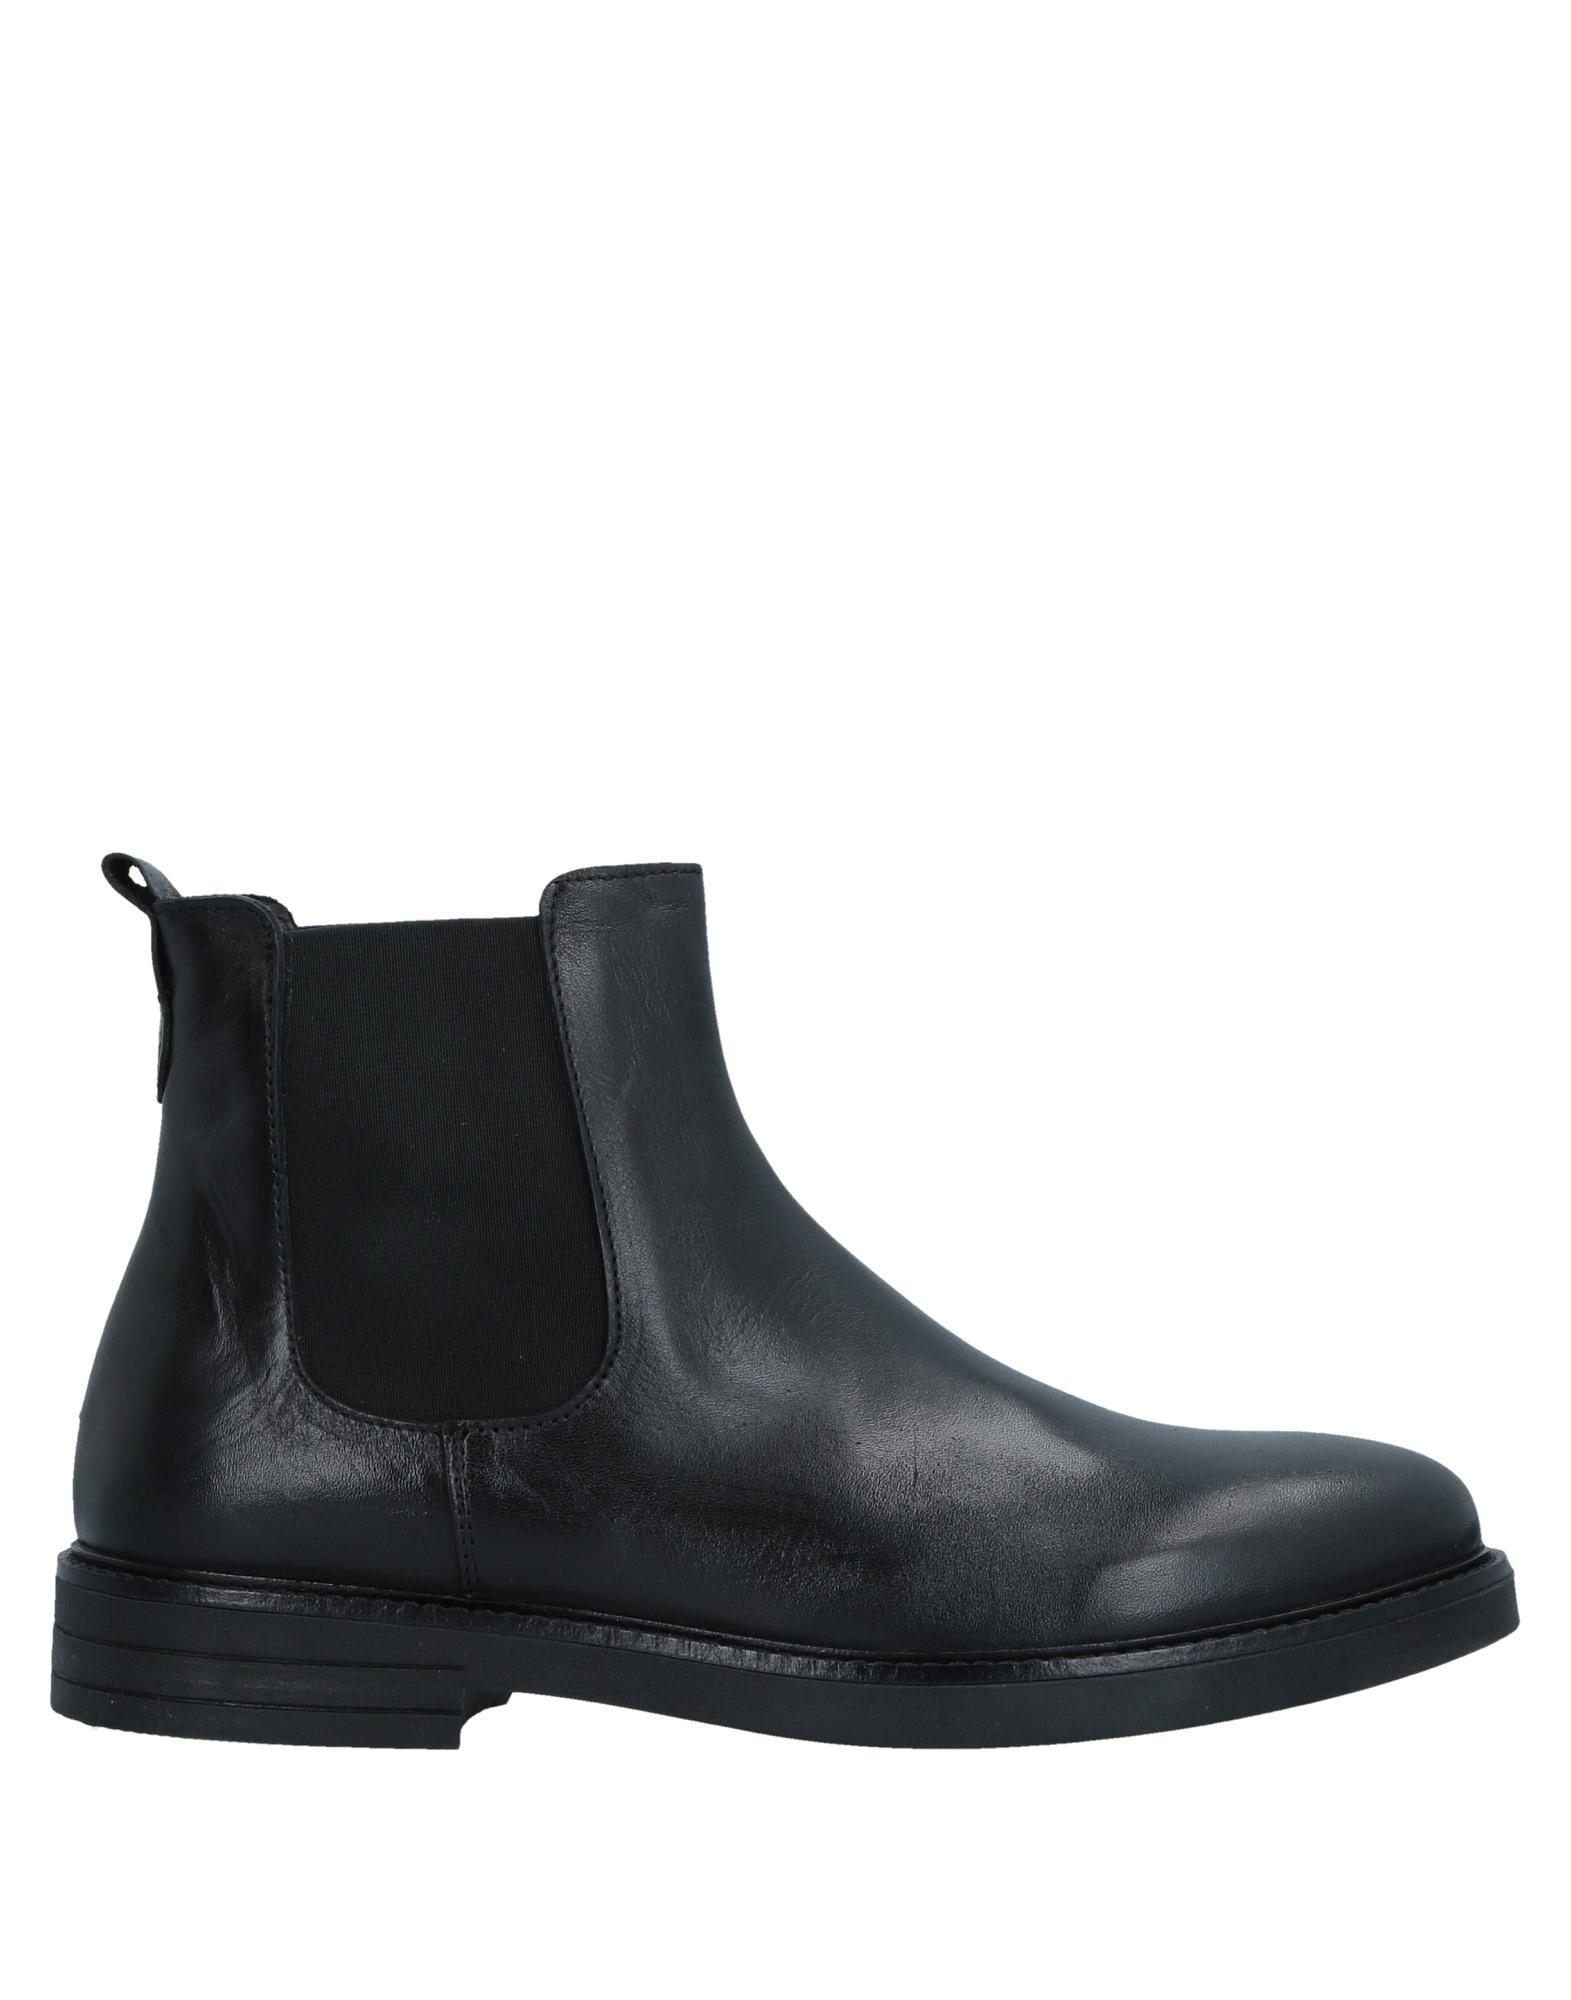 Rabatt echte Schuhe Roberto Della Croce Stiefelette Herren  11529918MH